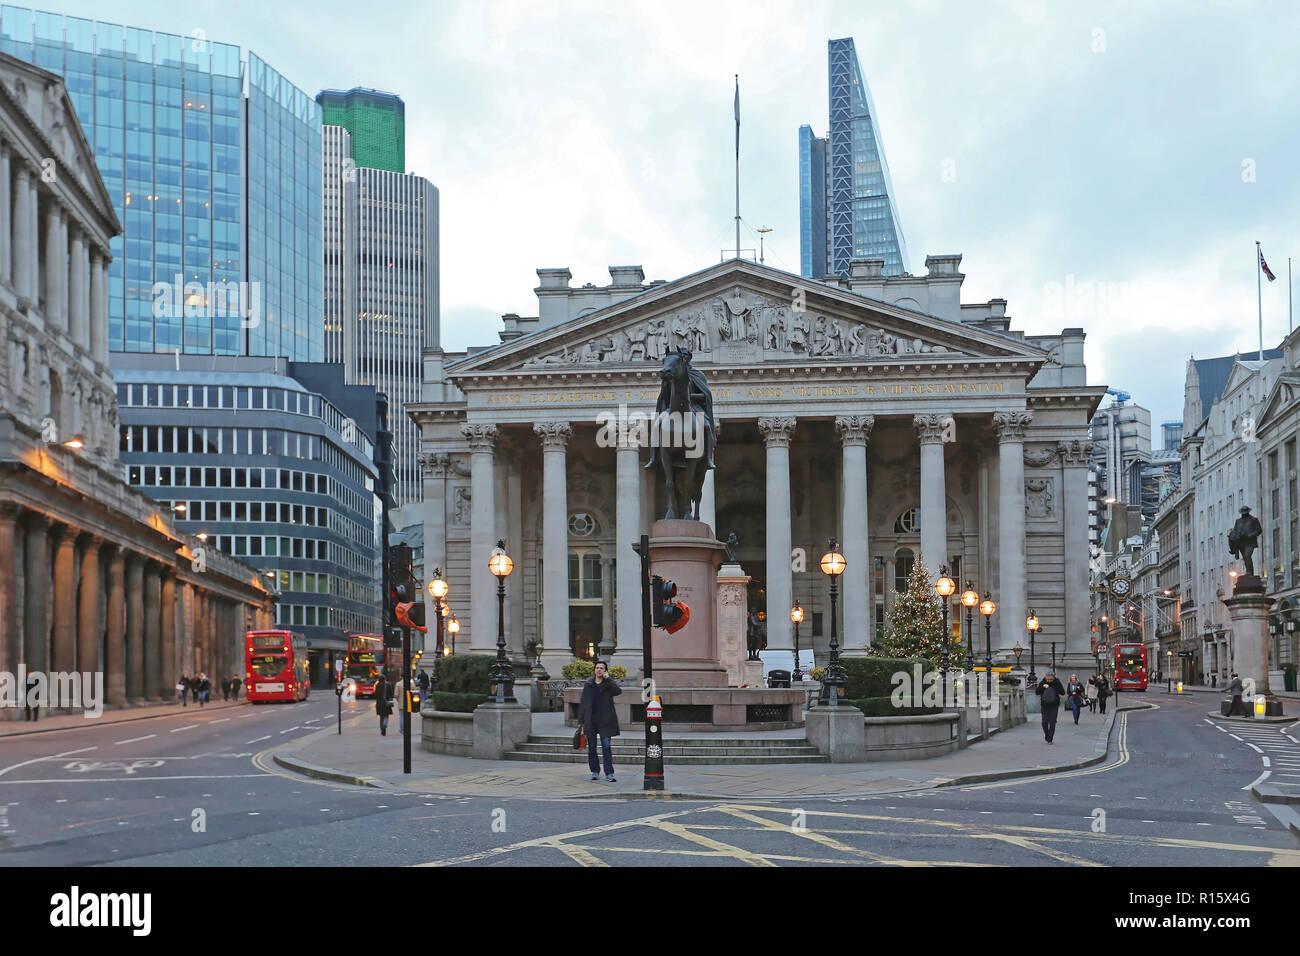 London, United Kingdom - November 23, 2013: Historic Building of Royal Exchange at Bank Junction in London, UK. - Stock Image